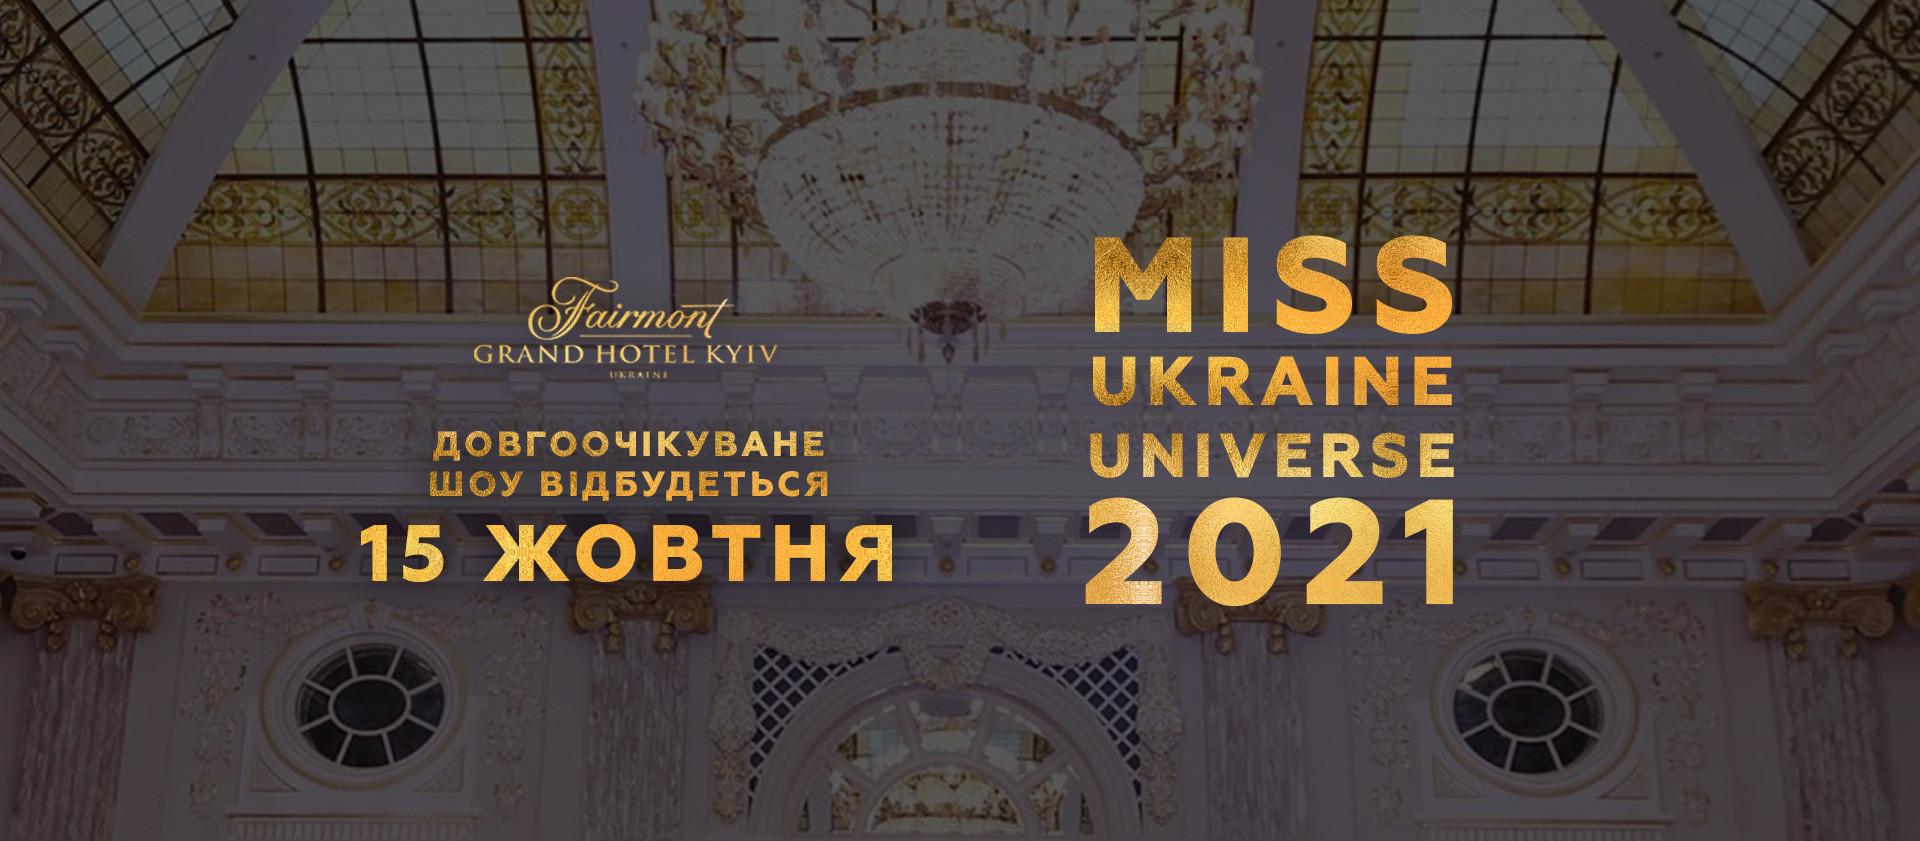 candidatas a miss universe ukraine 2021. final: 15 oct. - Página 2 5f0gPp